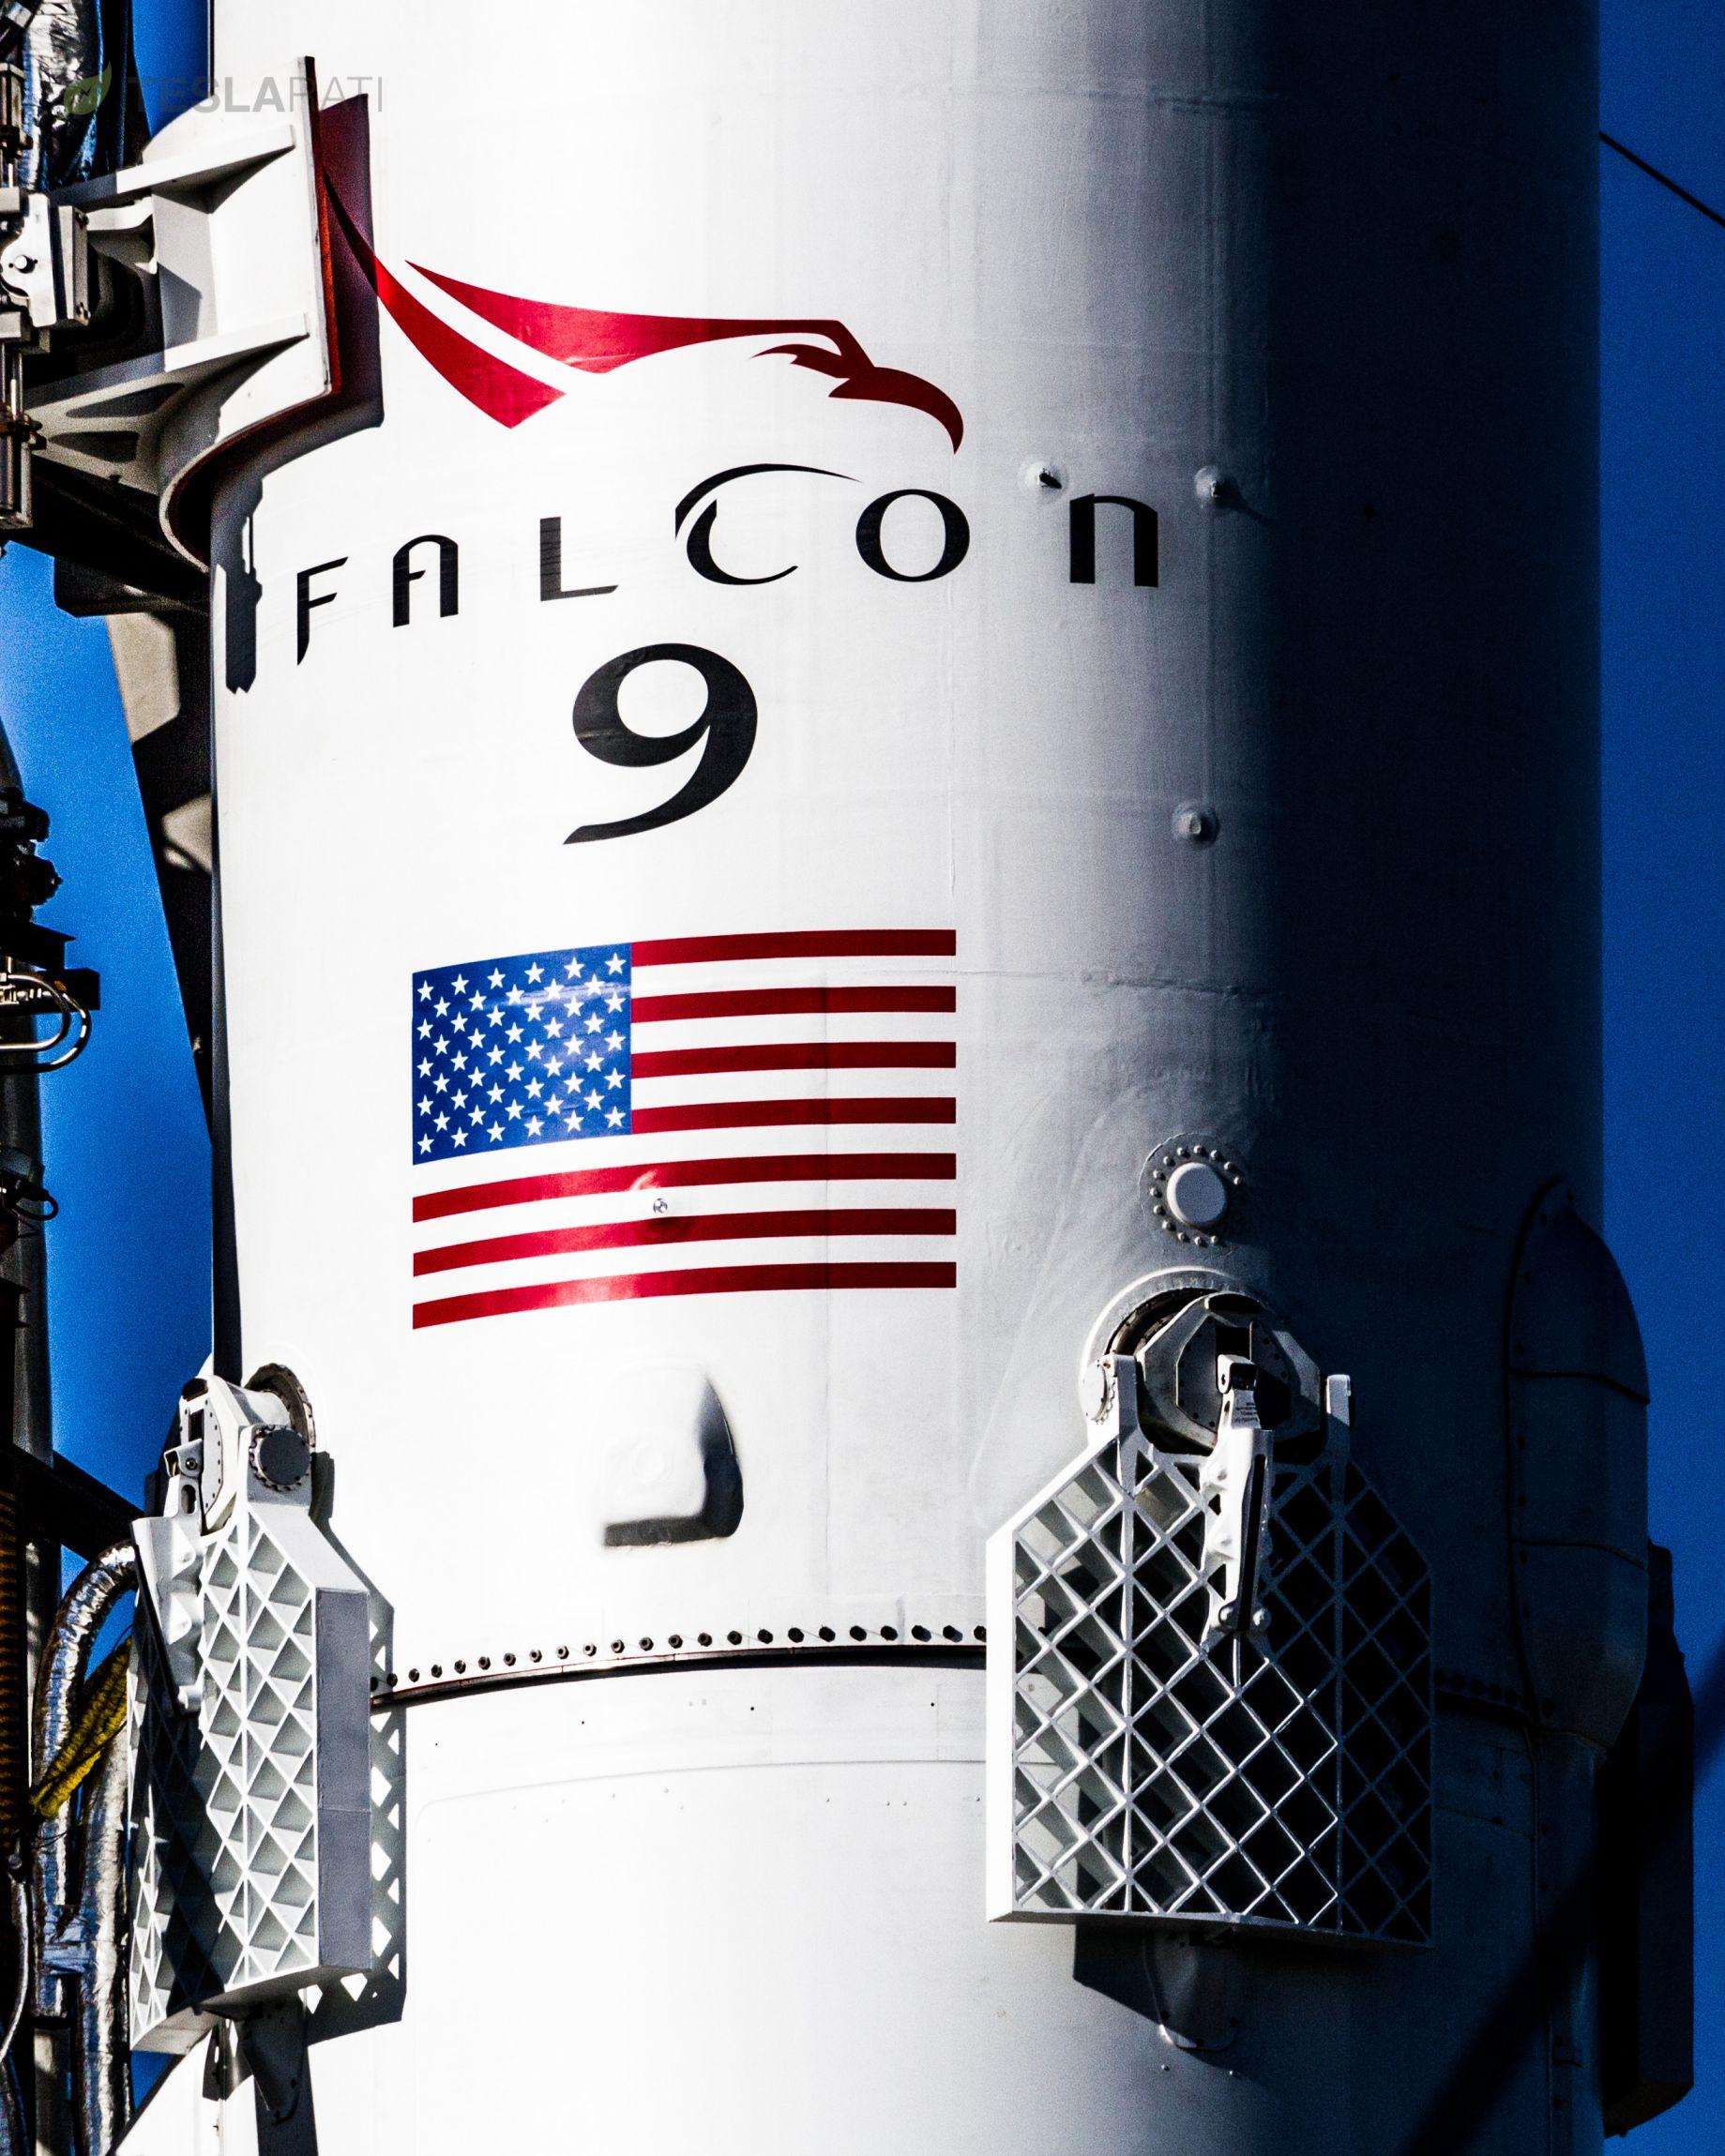 Zuma Falcon 9 detail (Tom Cross)